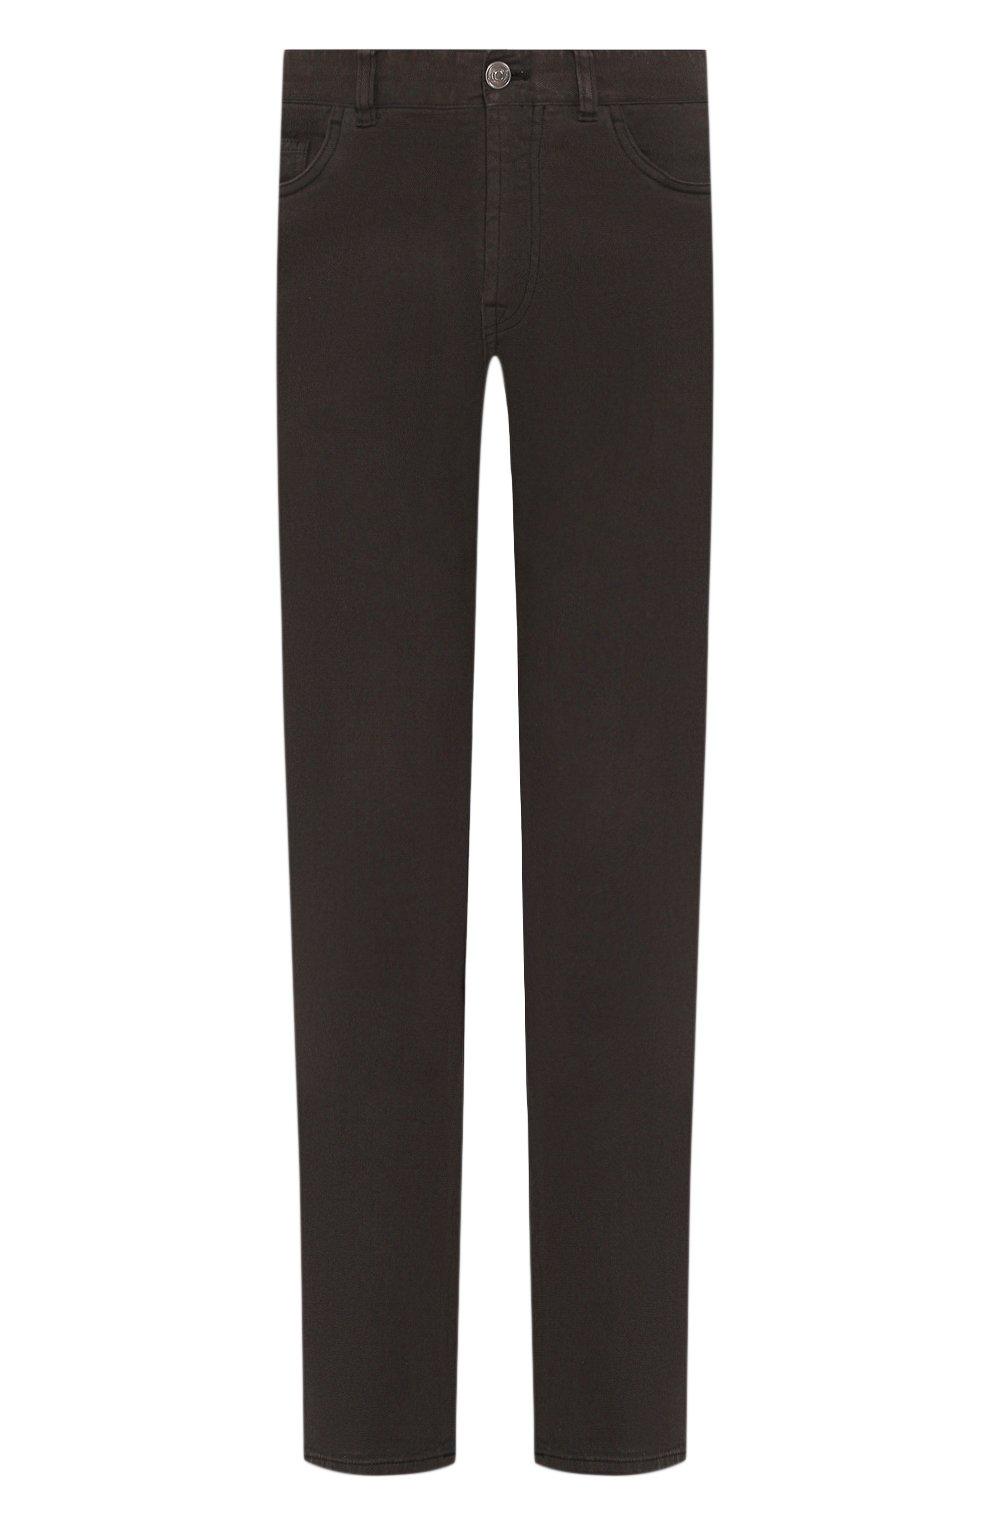 Мужские джинсы BRIONI темно-зеленого цвета, арт. SPNJ0M/08T01/STELVI0   Фото 1